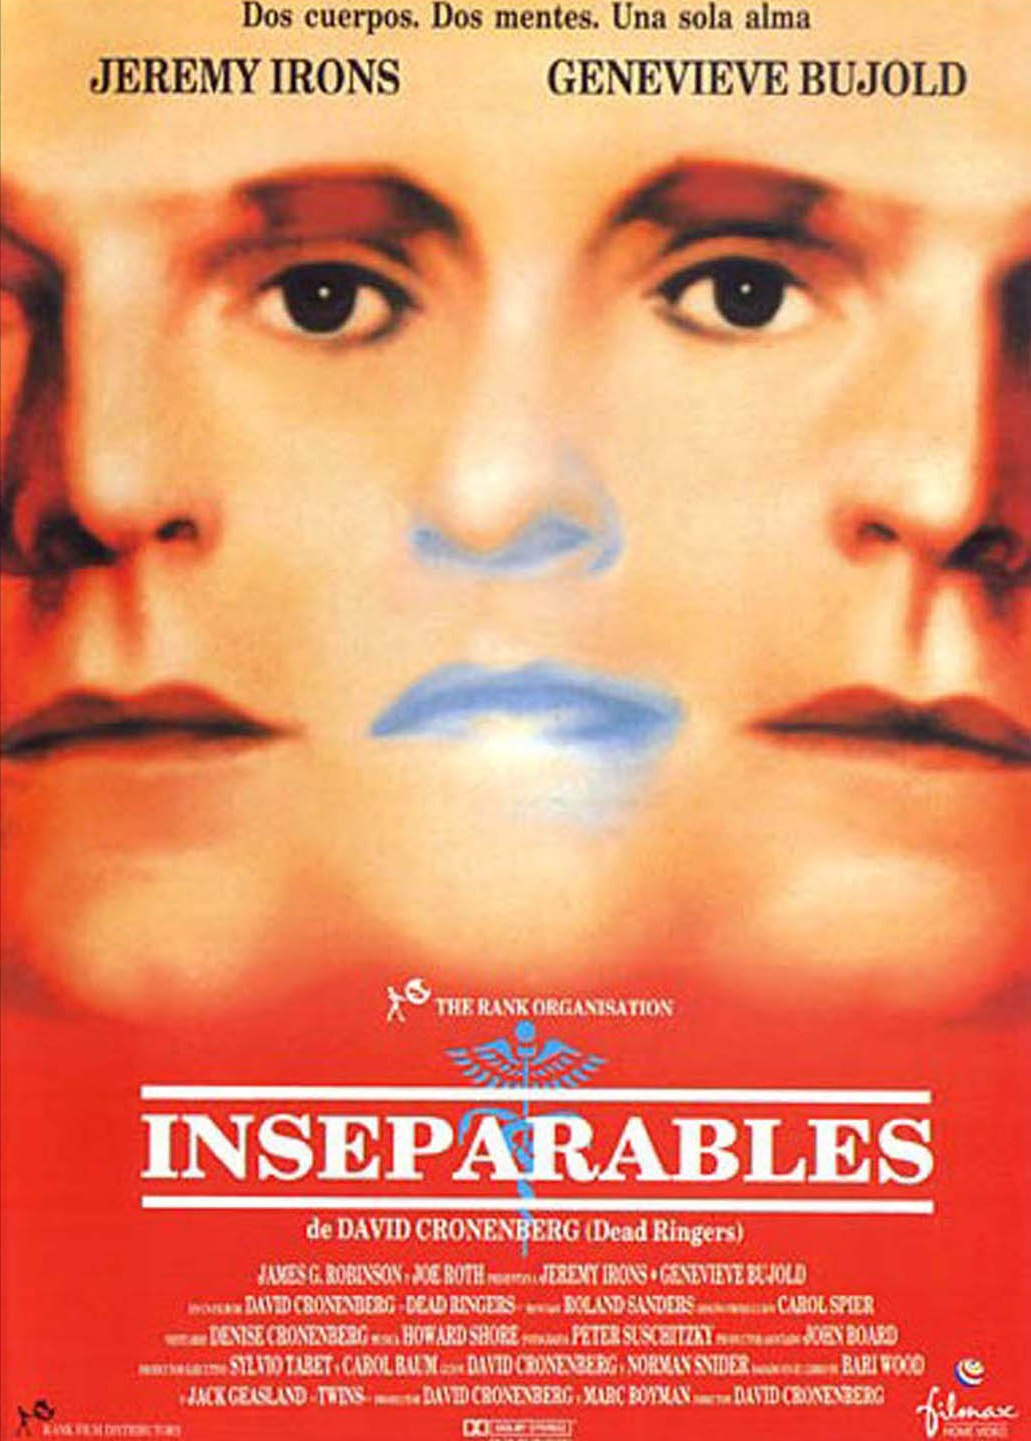 http://2.bp.blogspot.com/-r0VUEpL7mXo/Ted2FZkvlVI/AAAAAAAADc0/Cdx8U_GgI7c/s1600/Inseparables-Frontal-DVD.jpg